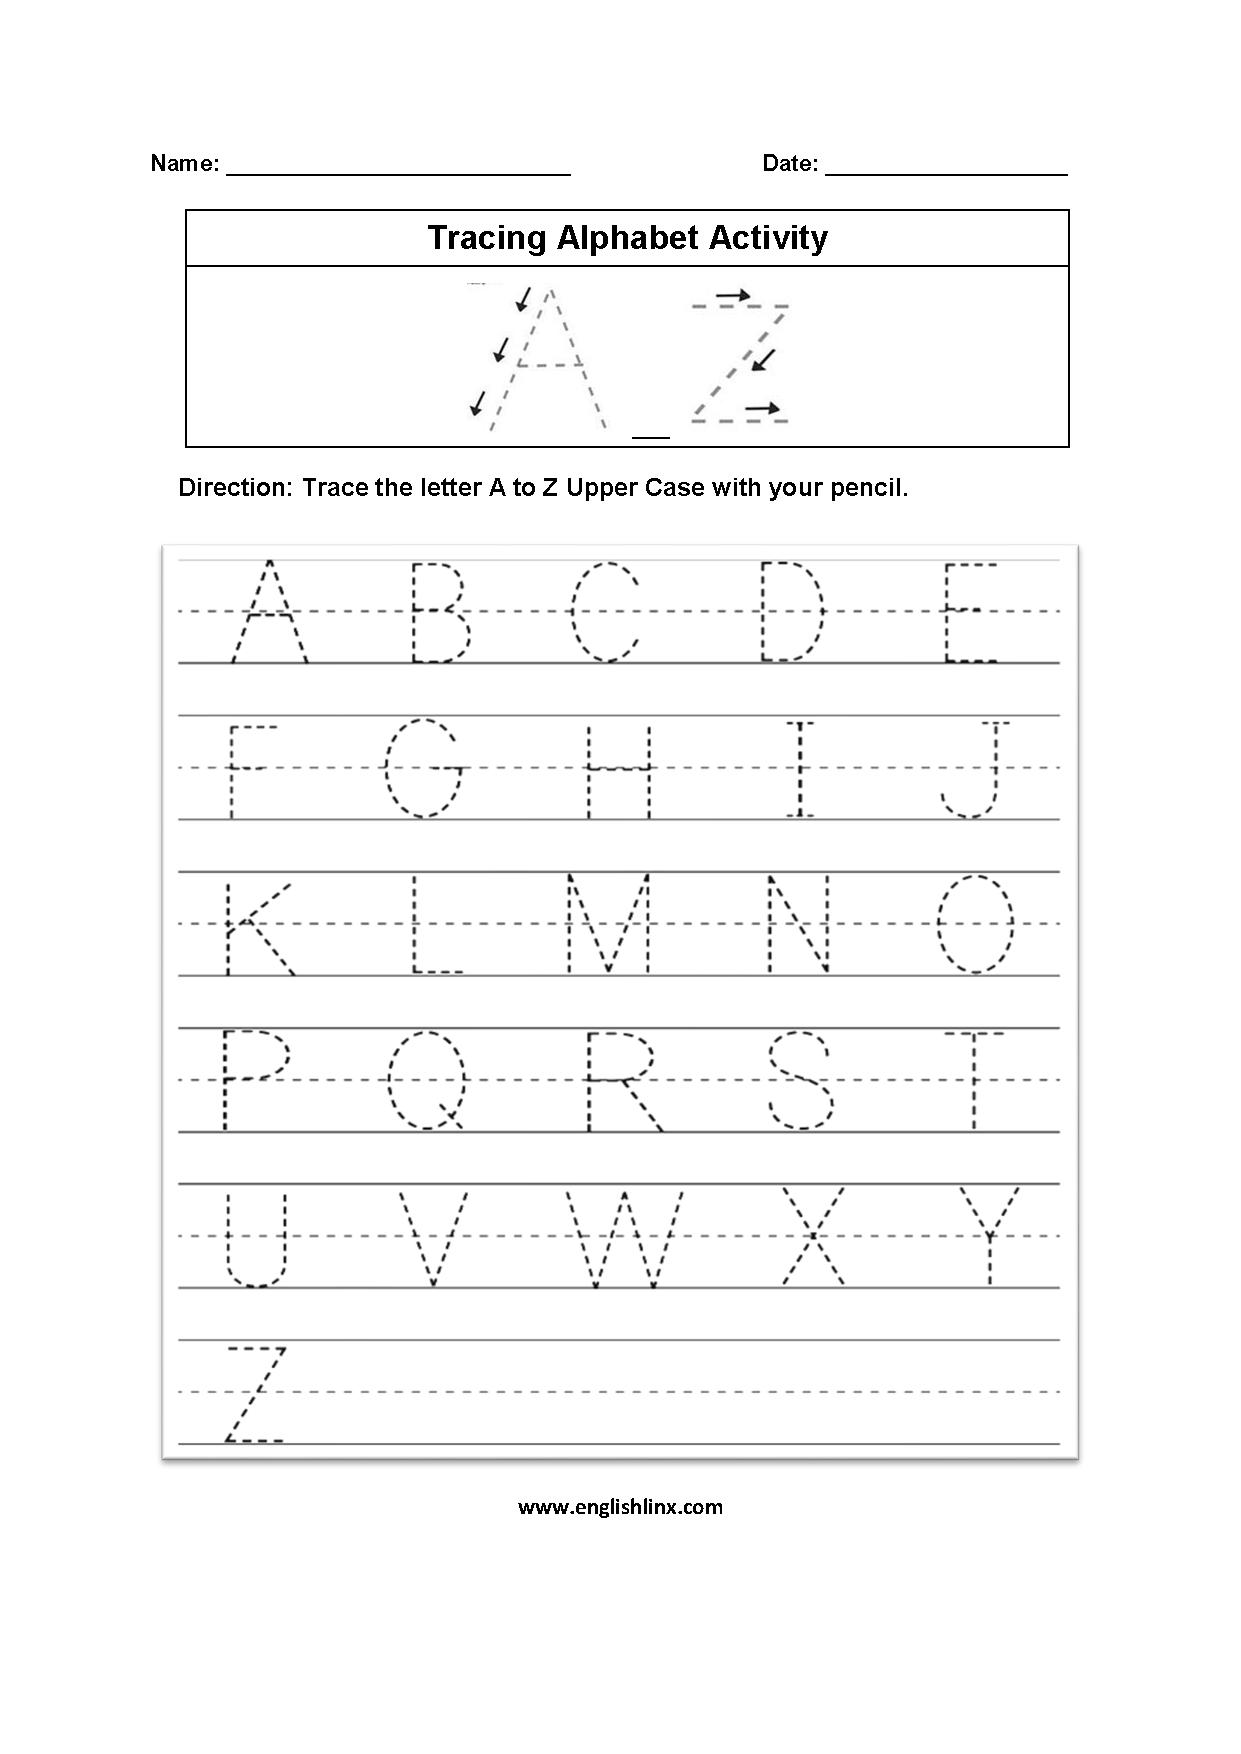 A To Z Alphabet Worksheets Pdf لم يسبق له مثيل الصور + Tier3.xyz in A-Z Alphabet Tracing